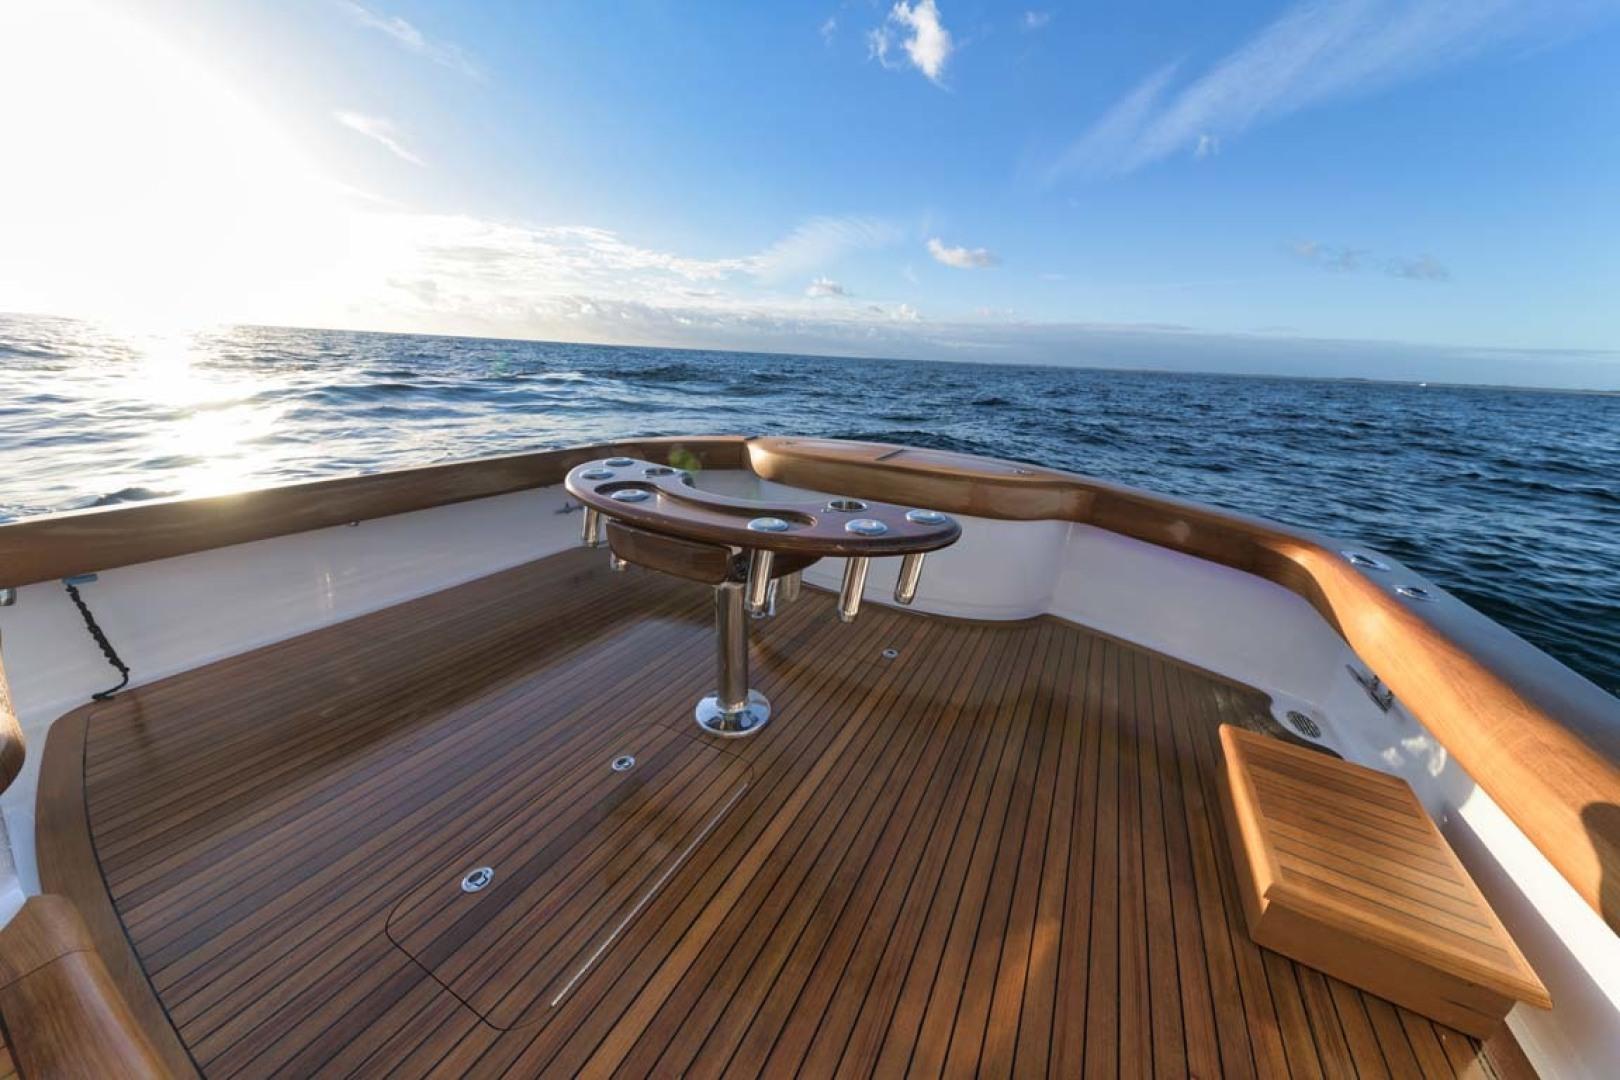 Winter Custom Yachts-46 Walkaround 2019-Family Circus Stuart-Florida-United States-Teak Cockpit Sole-1563778 | Thumbnail